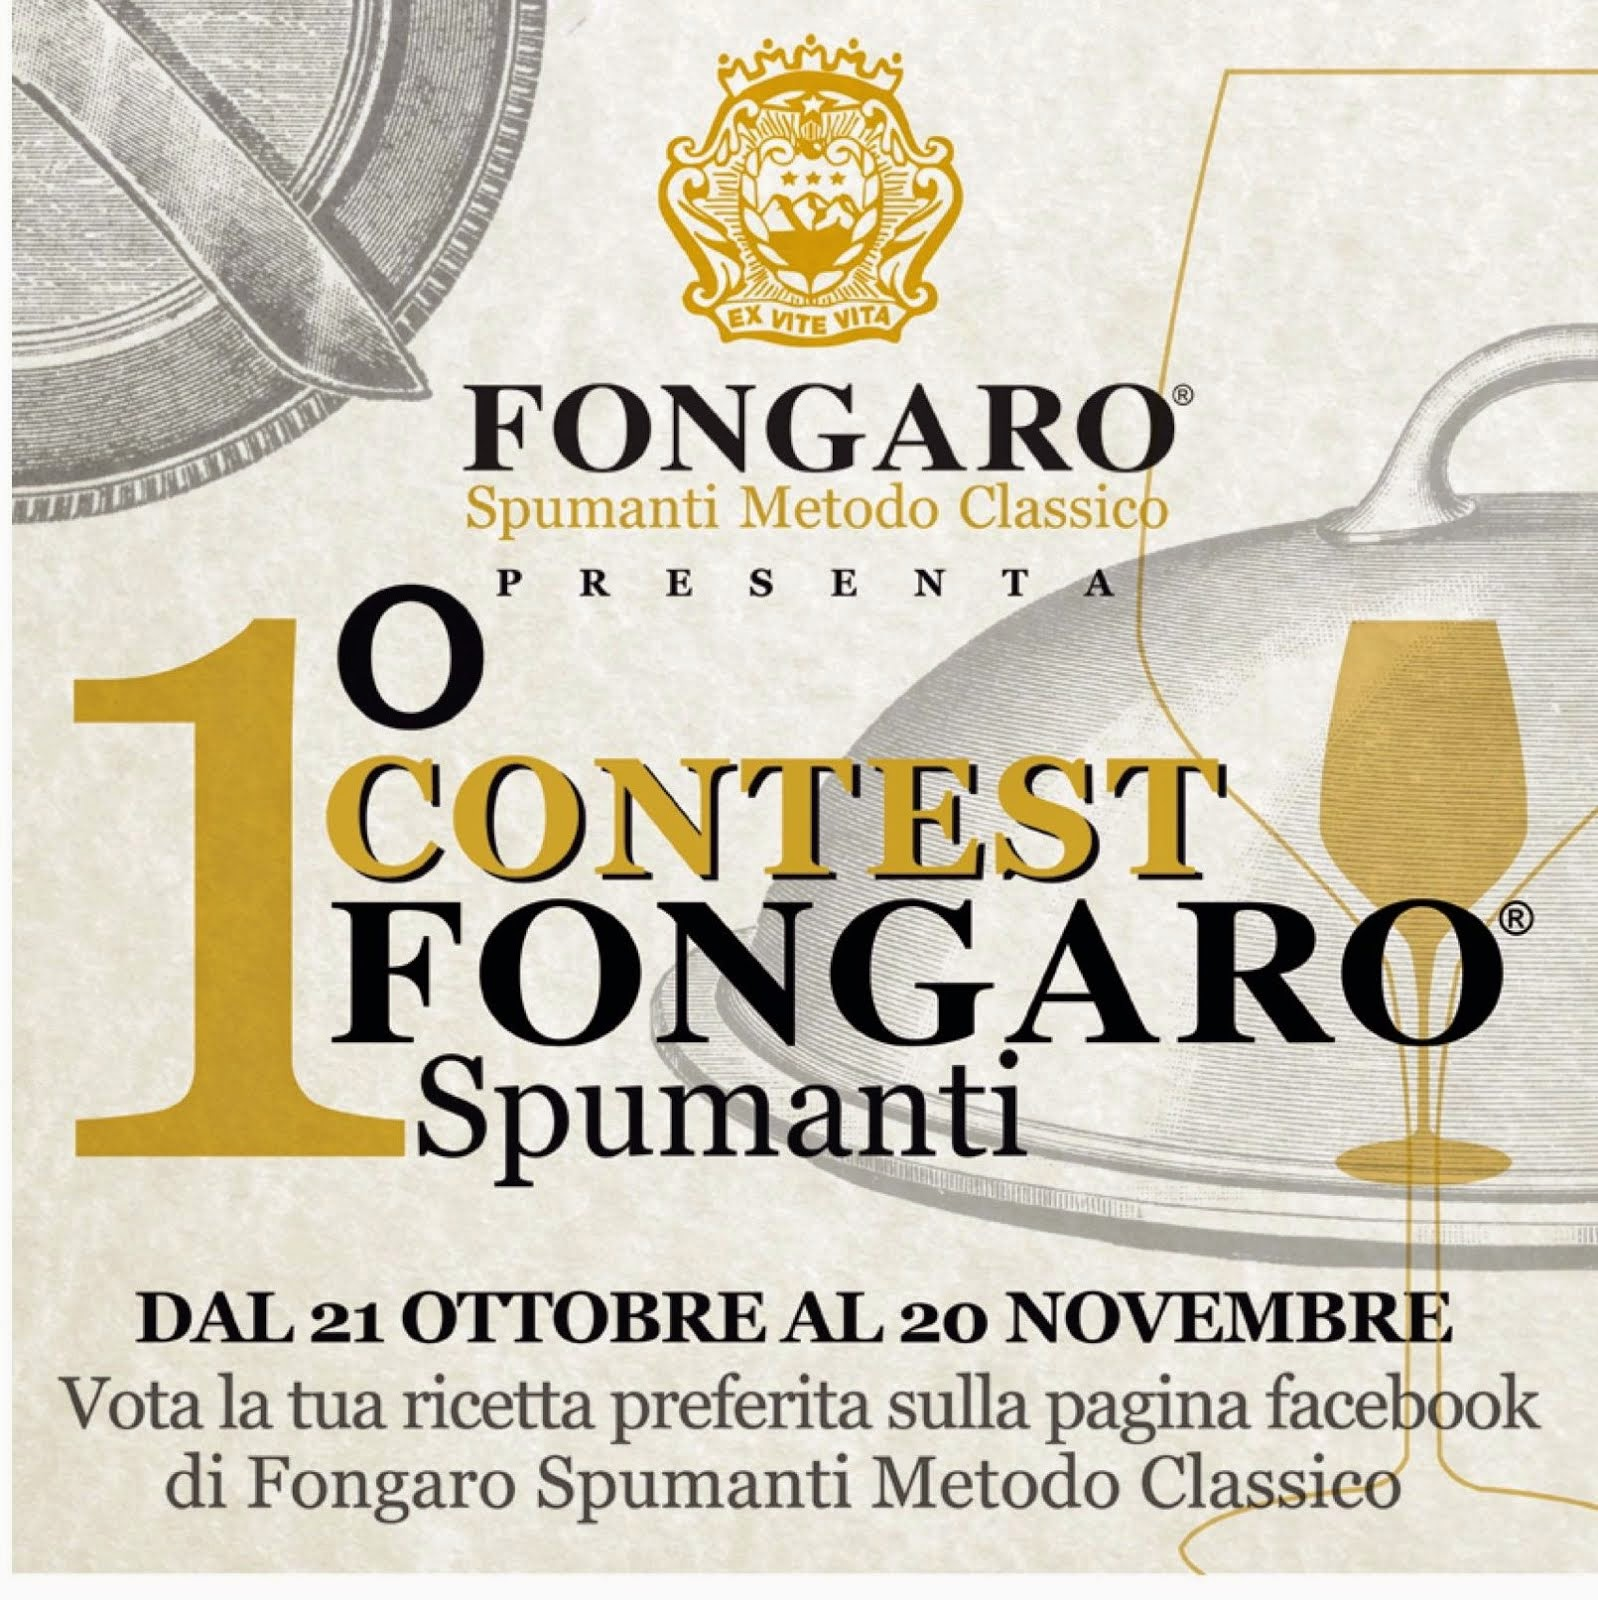 contest Fongaro spumanti